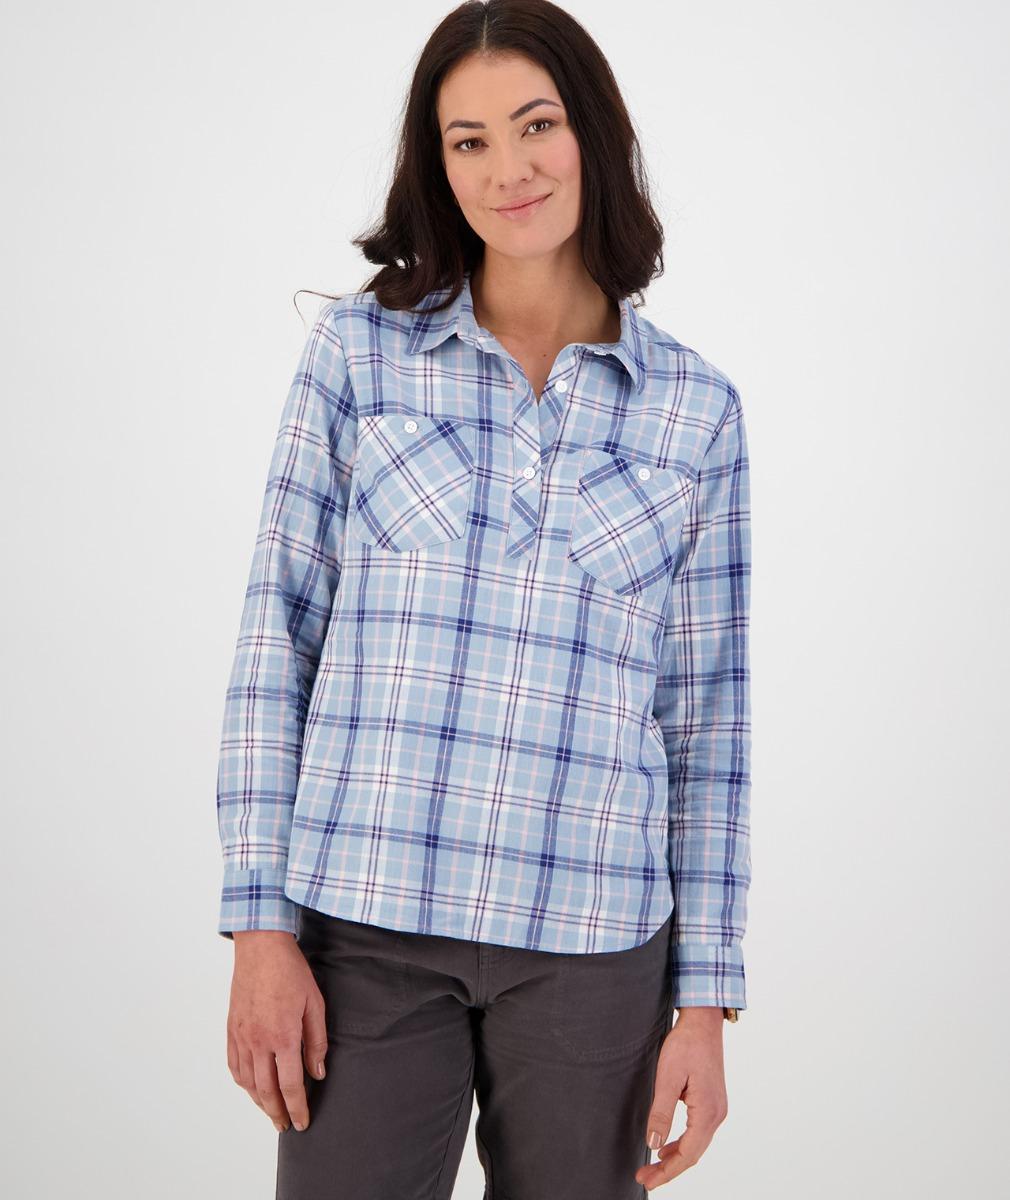 Swanndri Women's Flora Long Sleeve Shirt in Blue/Navy